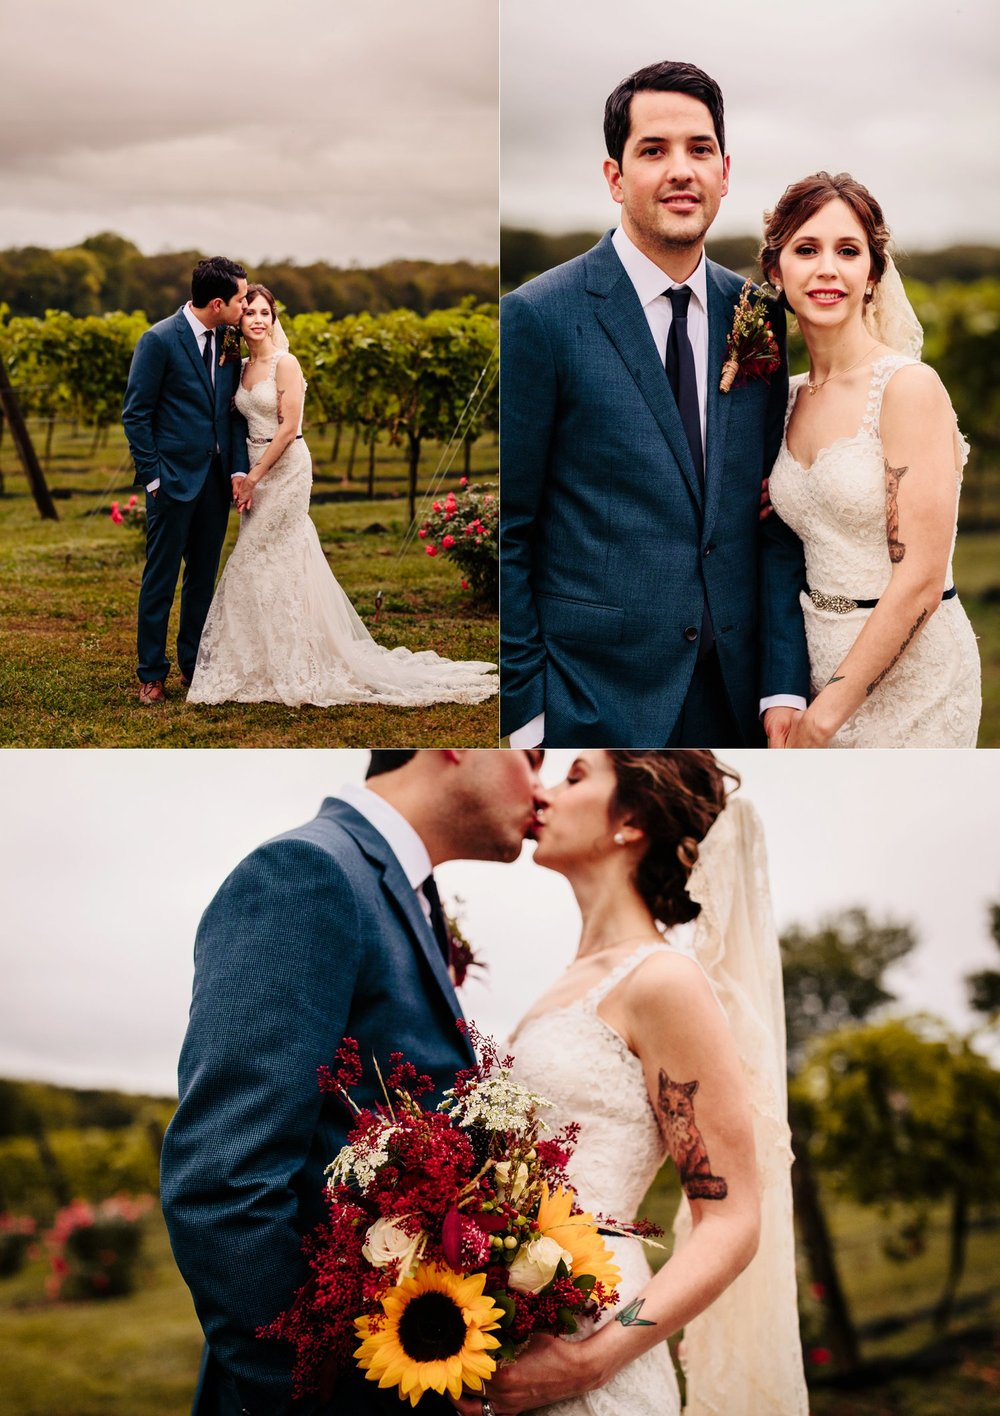 CK-Photo-arrington-wedding_0023.jpg